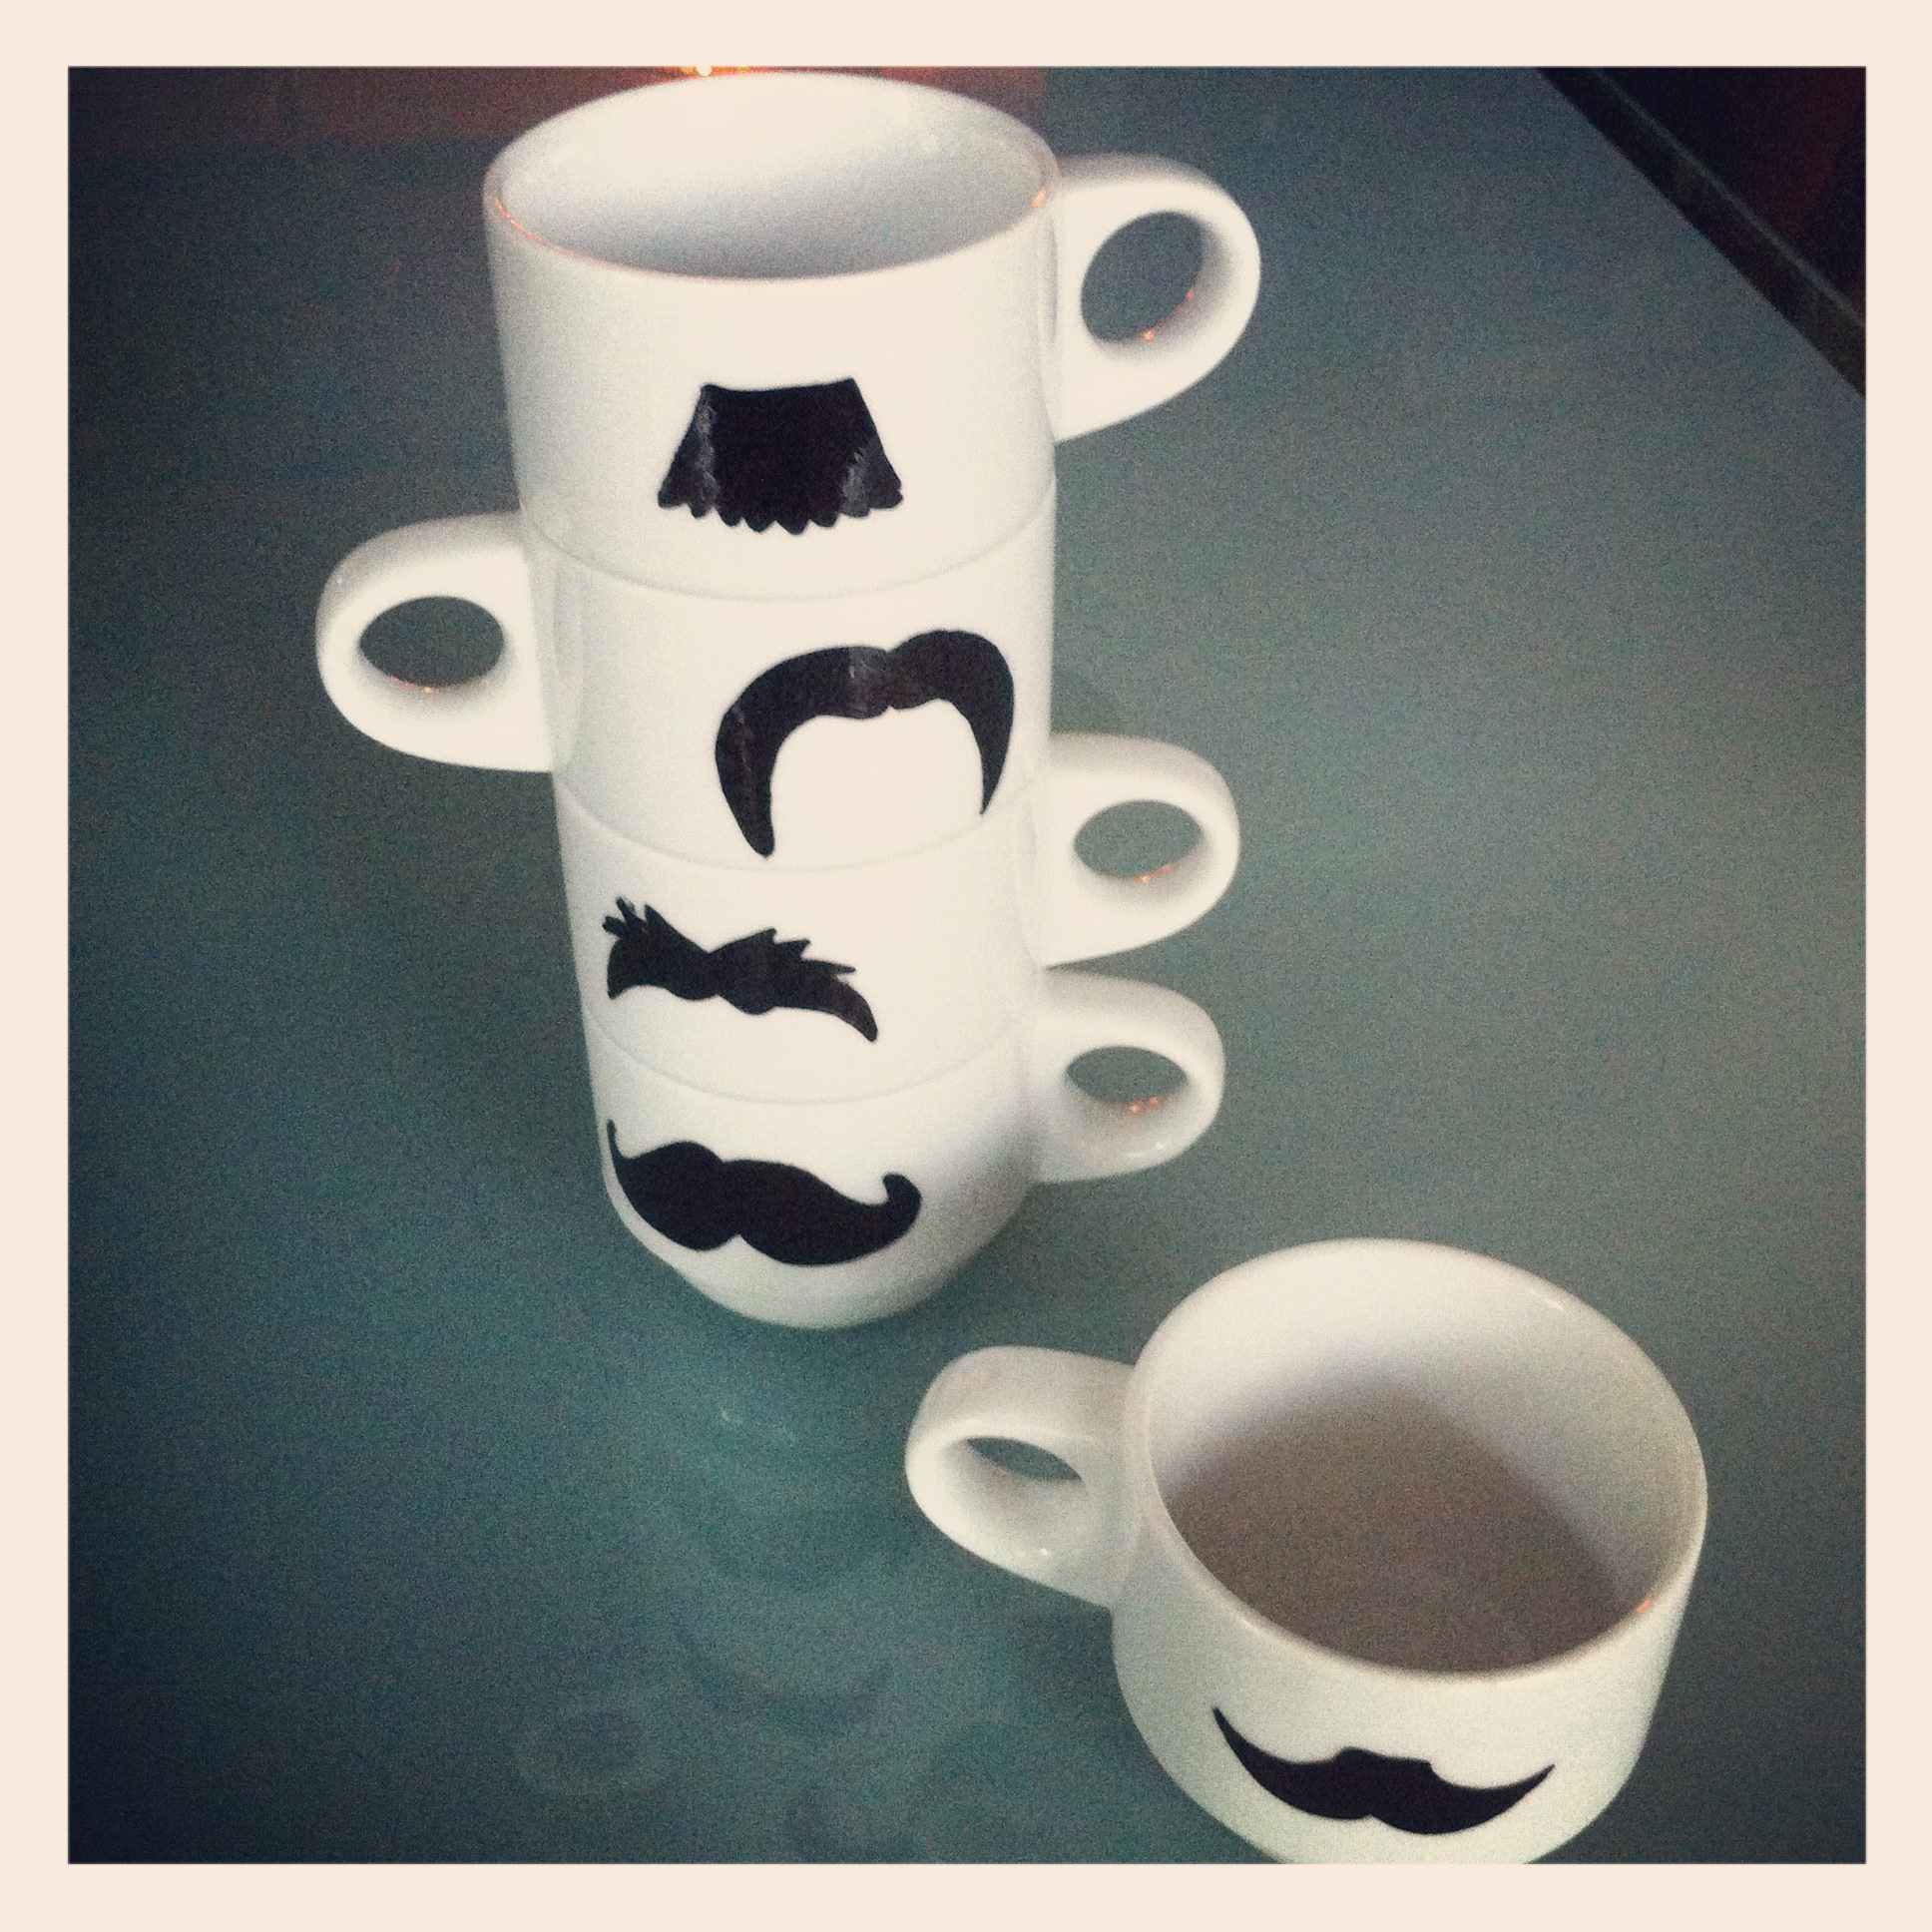 diy mustache mugs (back)